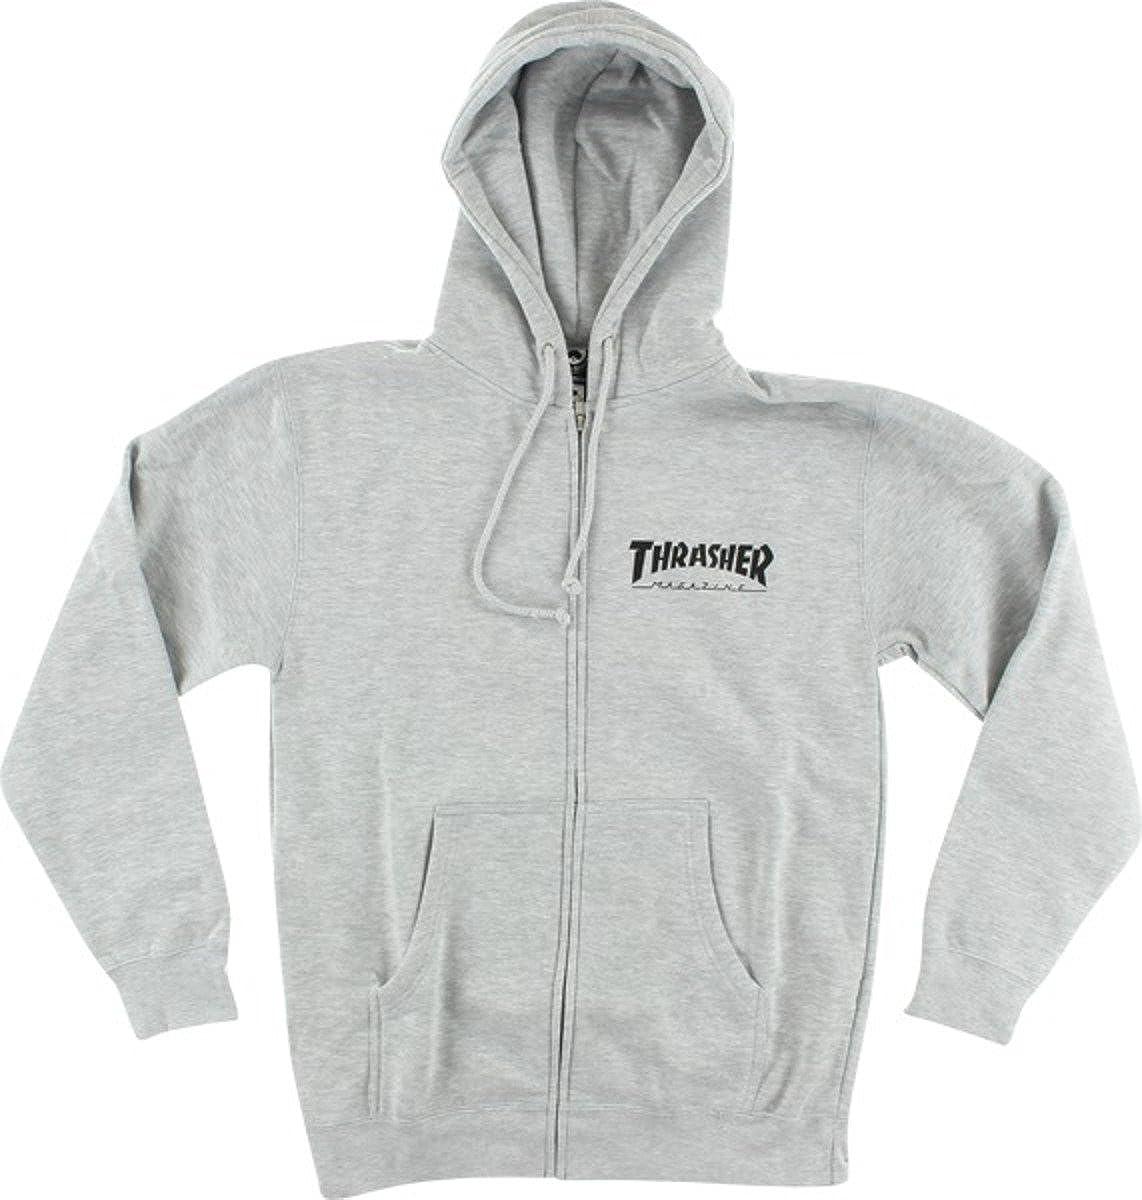 Large Thrasher Magazine Flames Heather Grey Hooded Sweatshirt